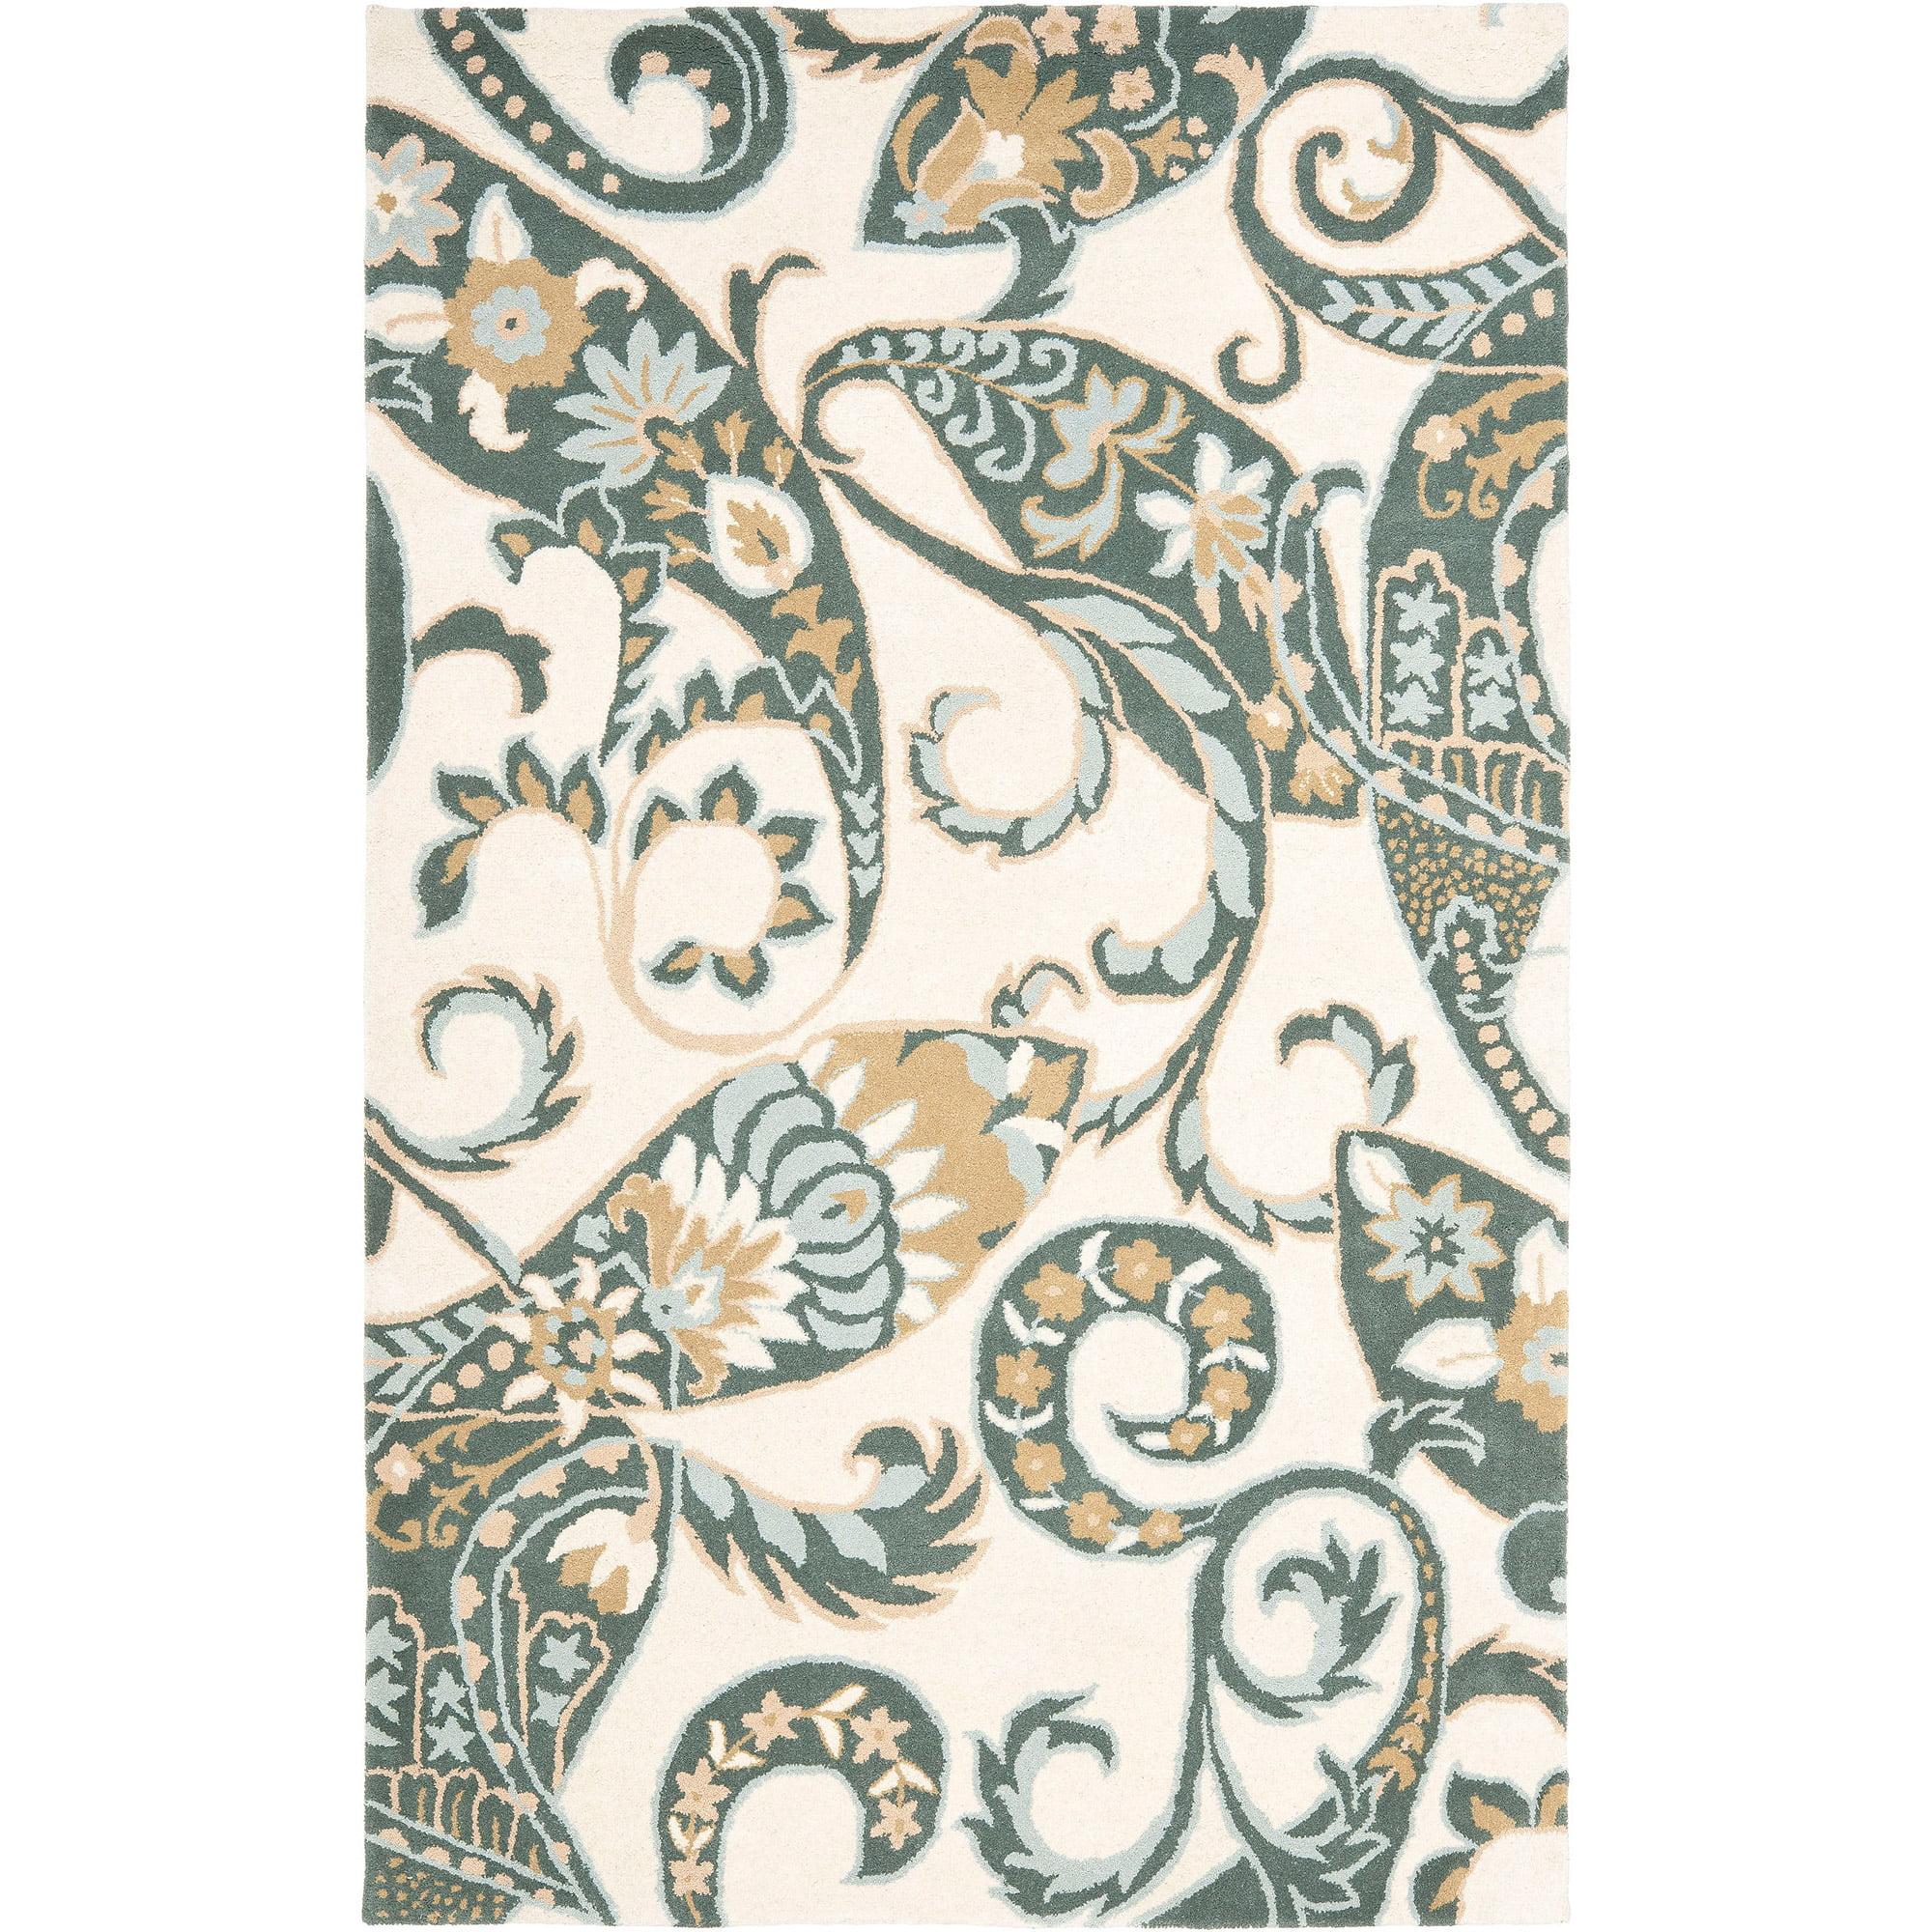 Safavieh Wyndham Terrance Wool Area Rug, Ivory/Multi